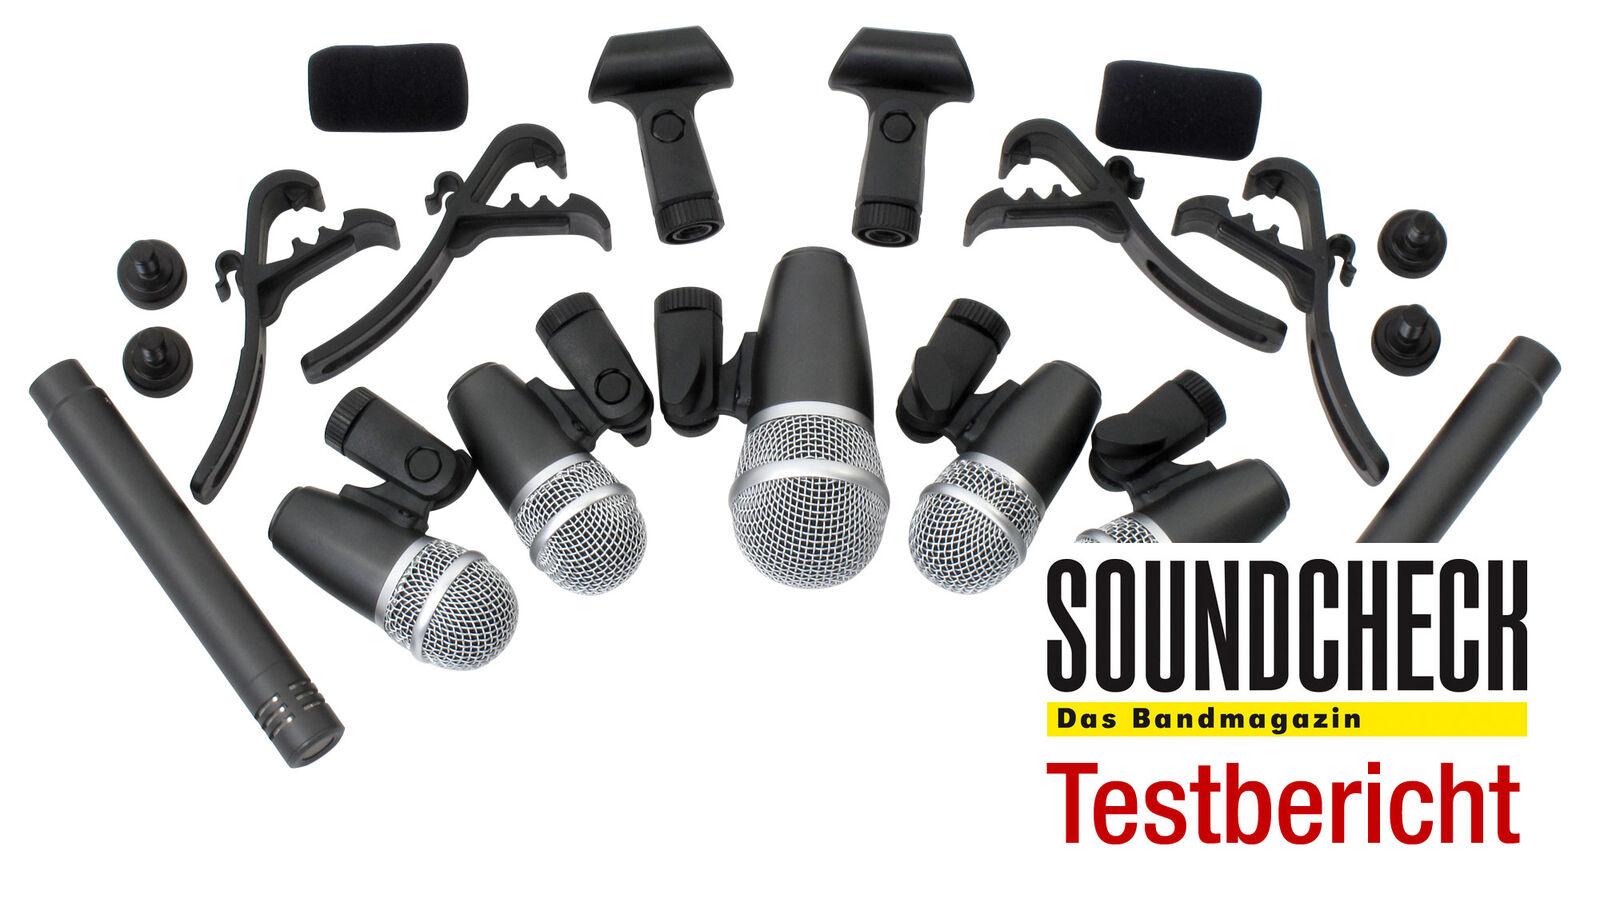 7-batería piezas micrófono set drum micrófono maleta maleta micrófono 1 Bass Drum 4 Tom 1 overhead 88f478